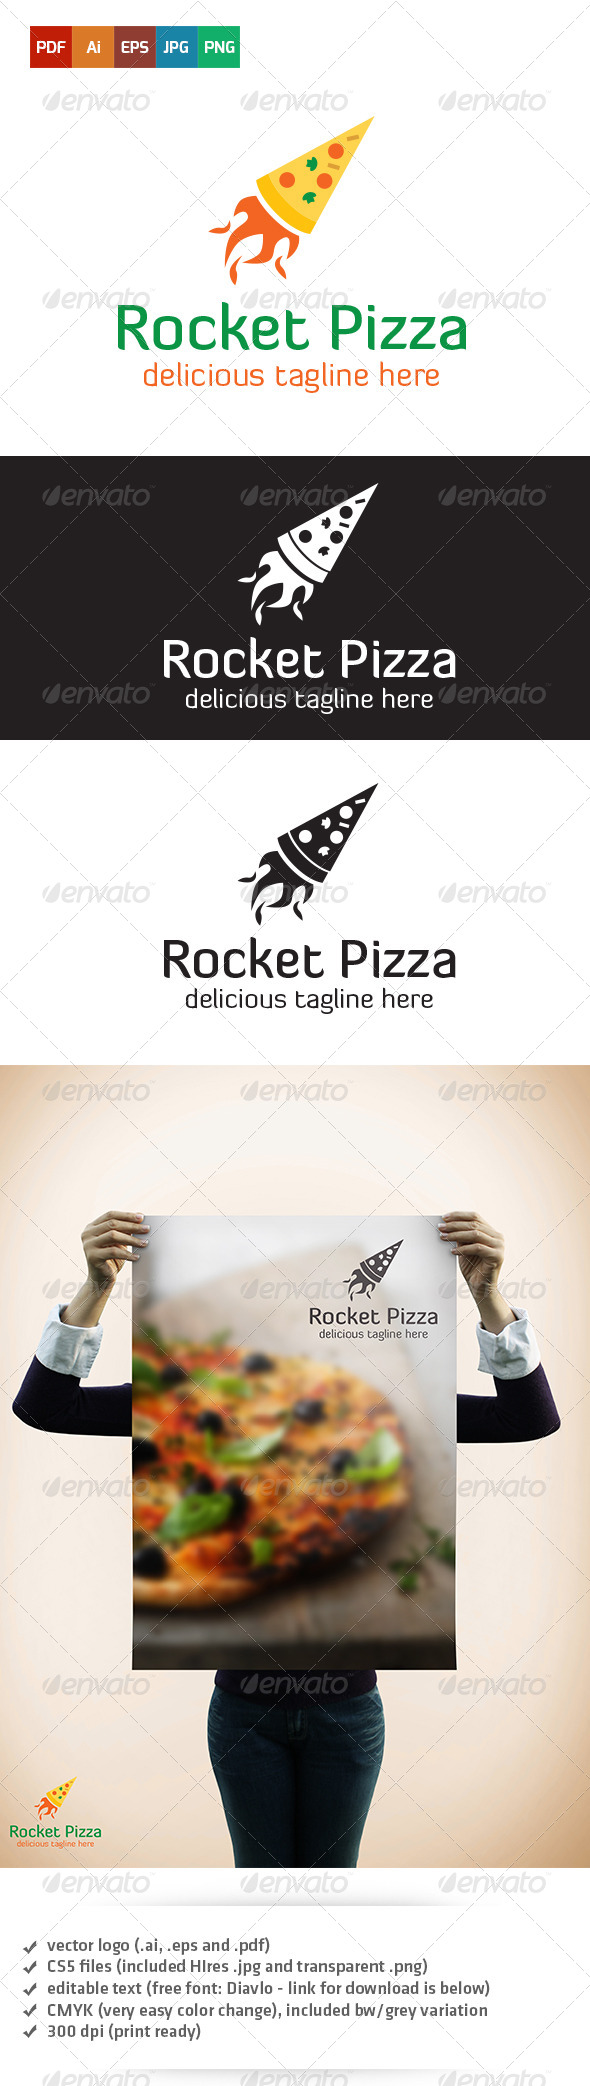 GraphicRiver Rocket Pizza Logo 5360408